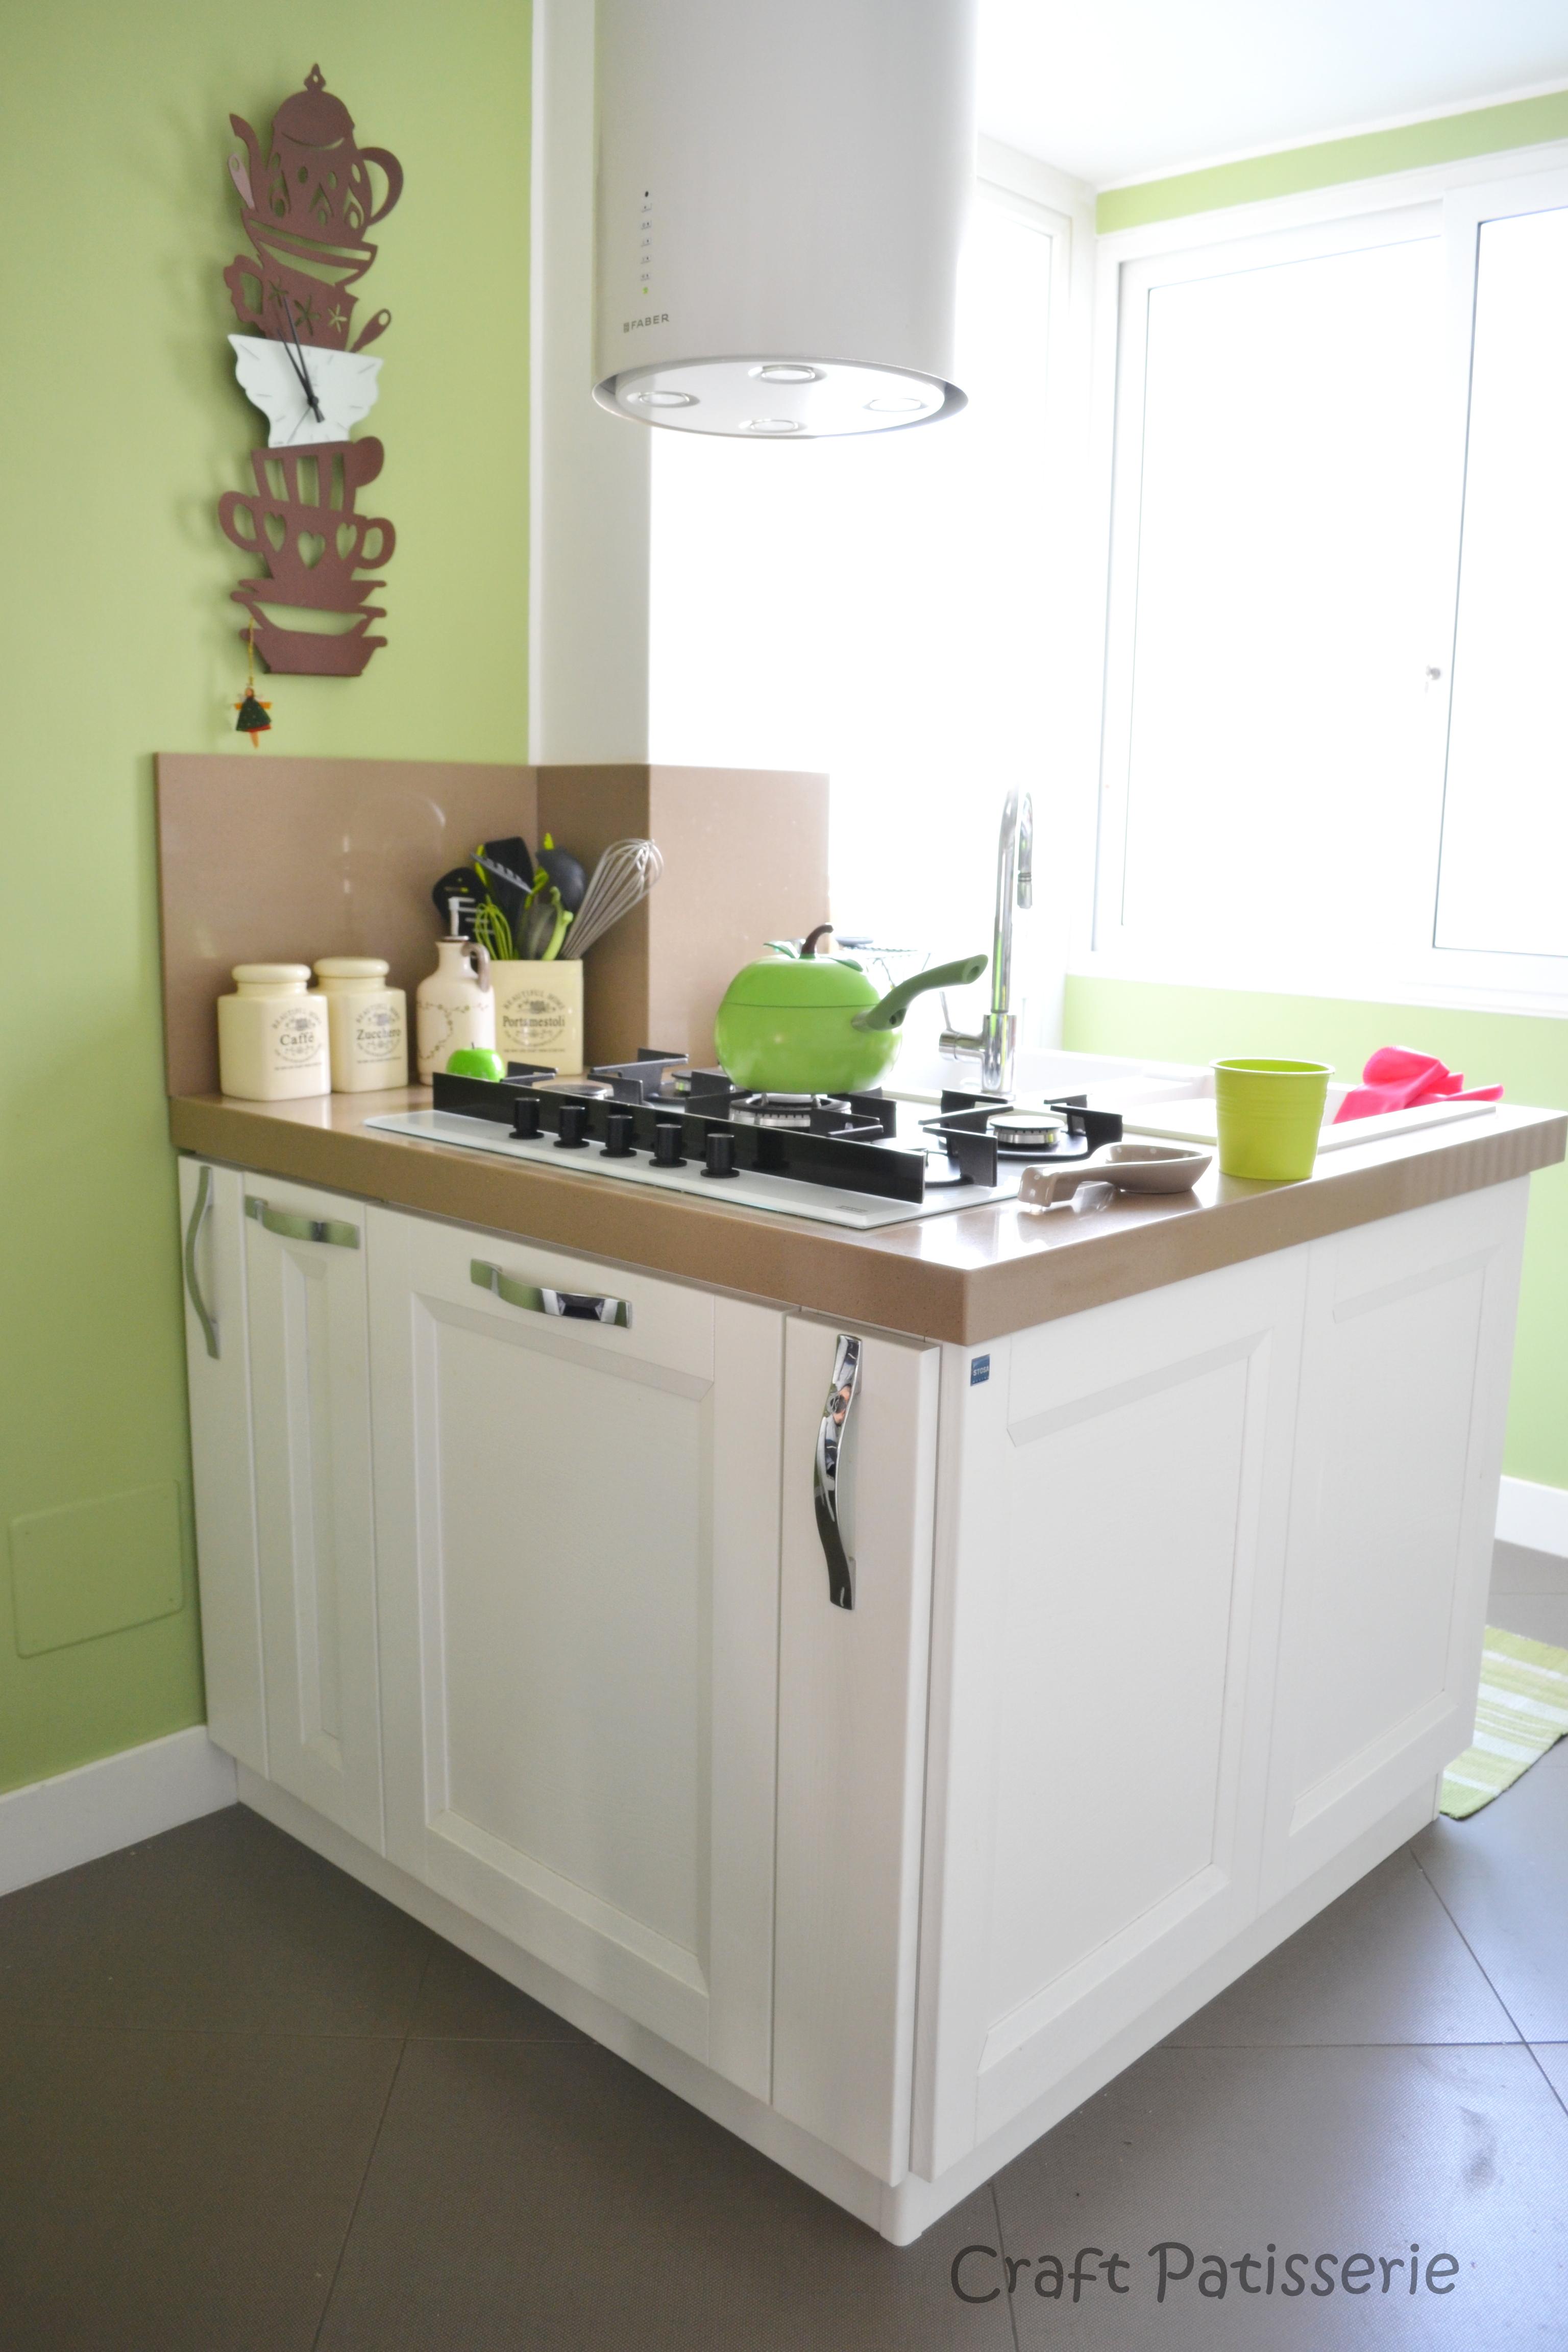 18 marzo 2013 craft patisserie - Cucina bianca ikea ...